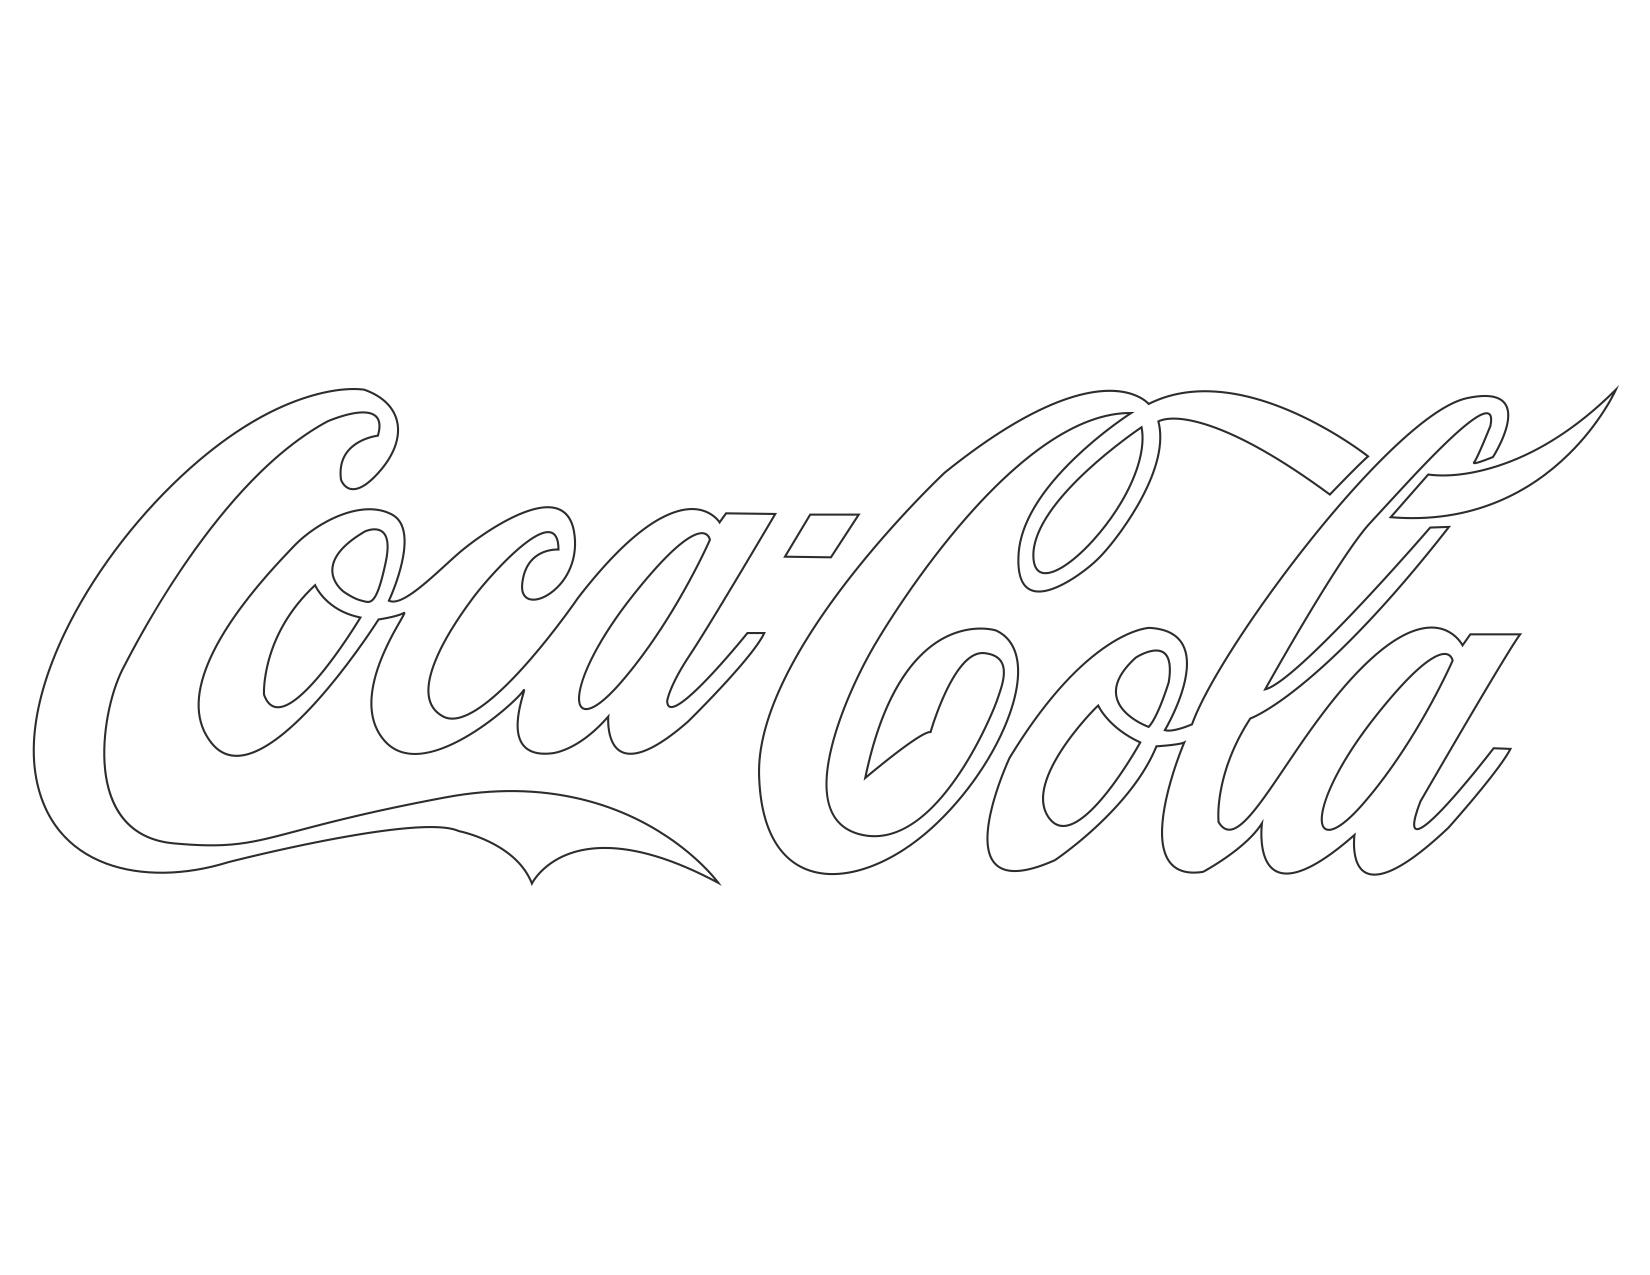 Coca Cola coloring #6, Download drawings